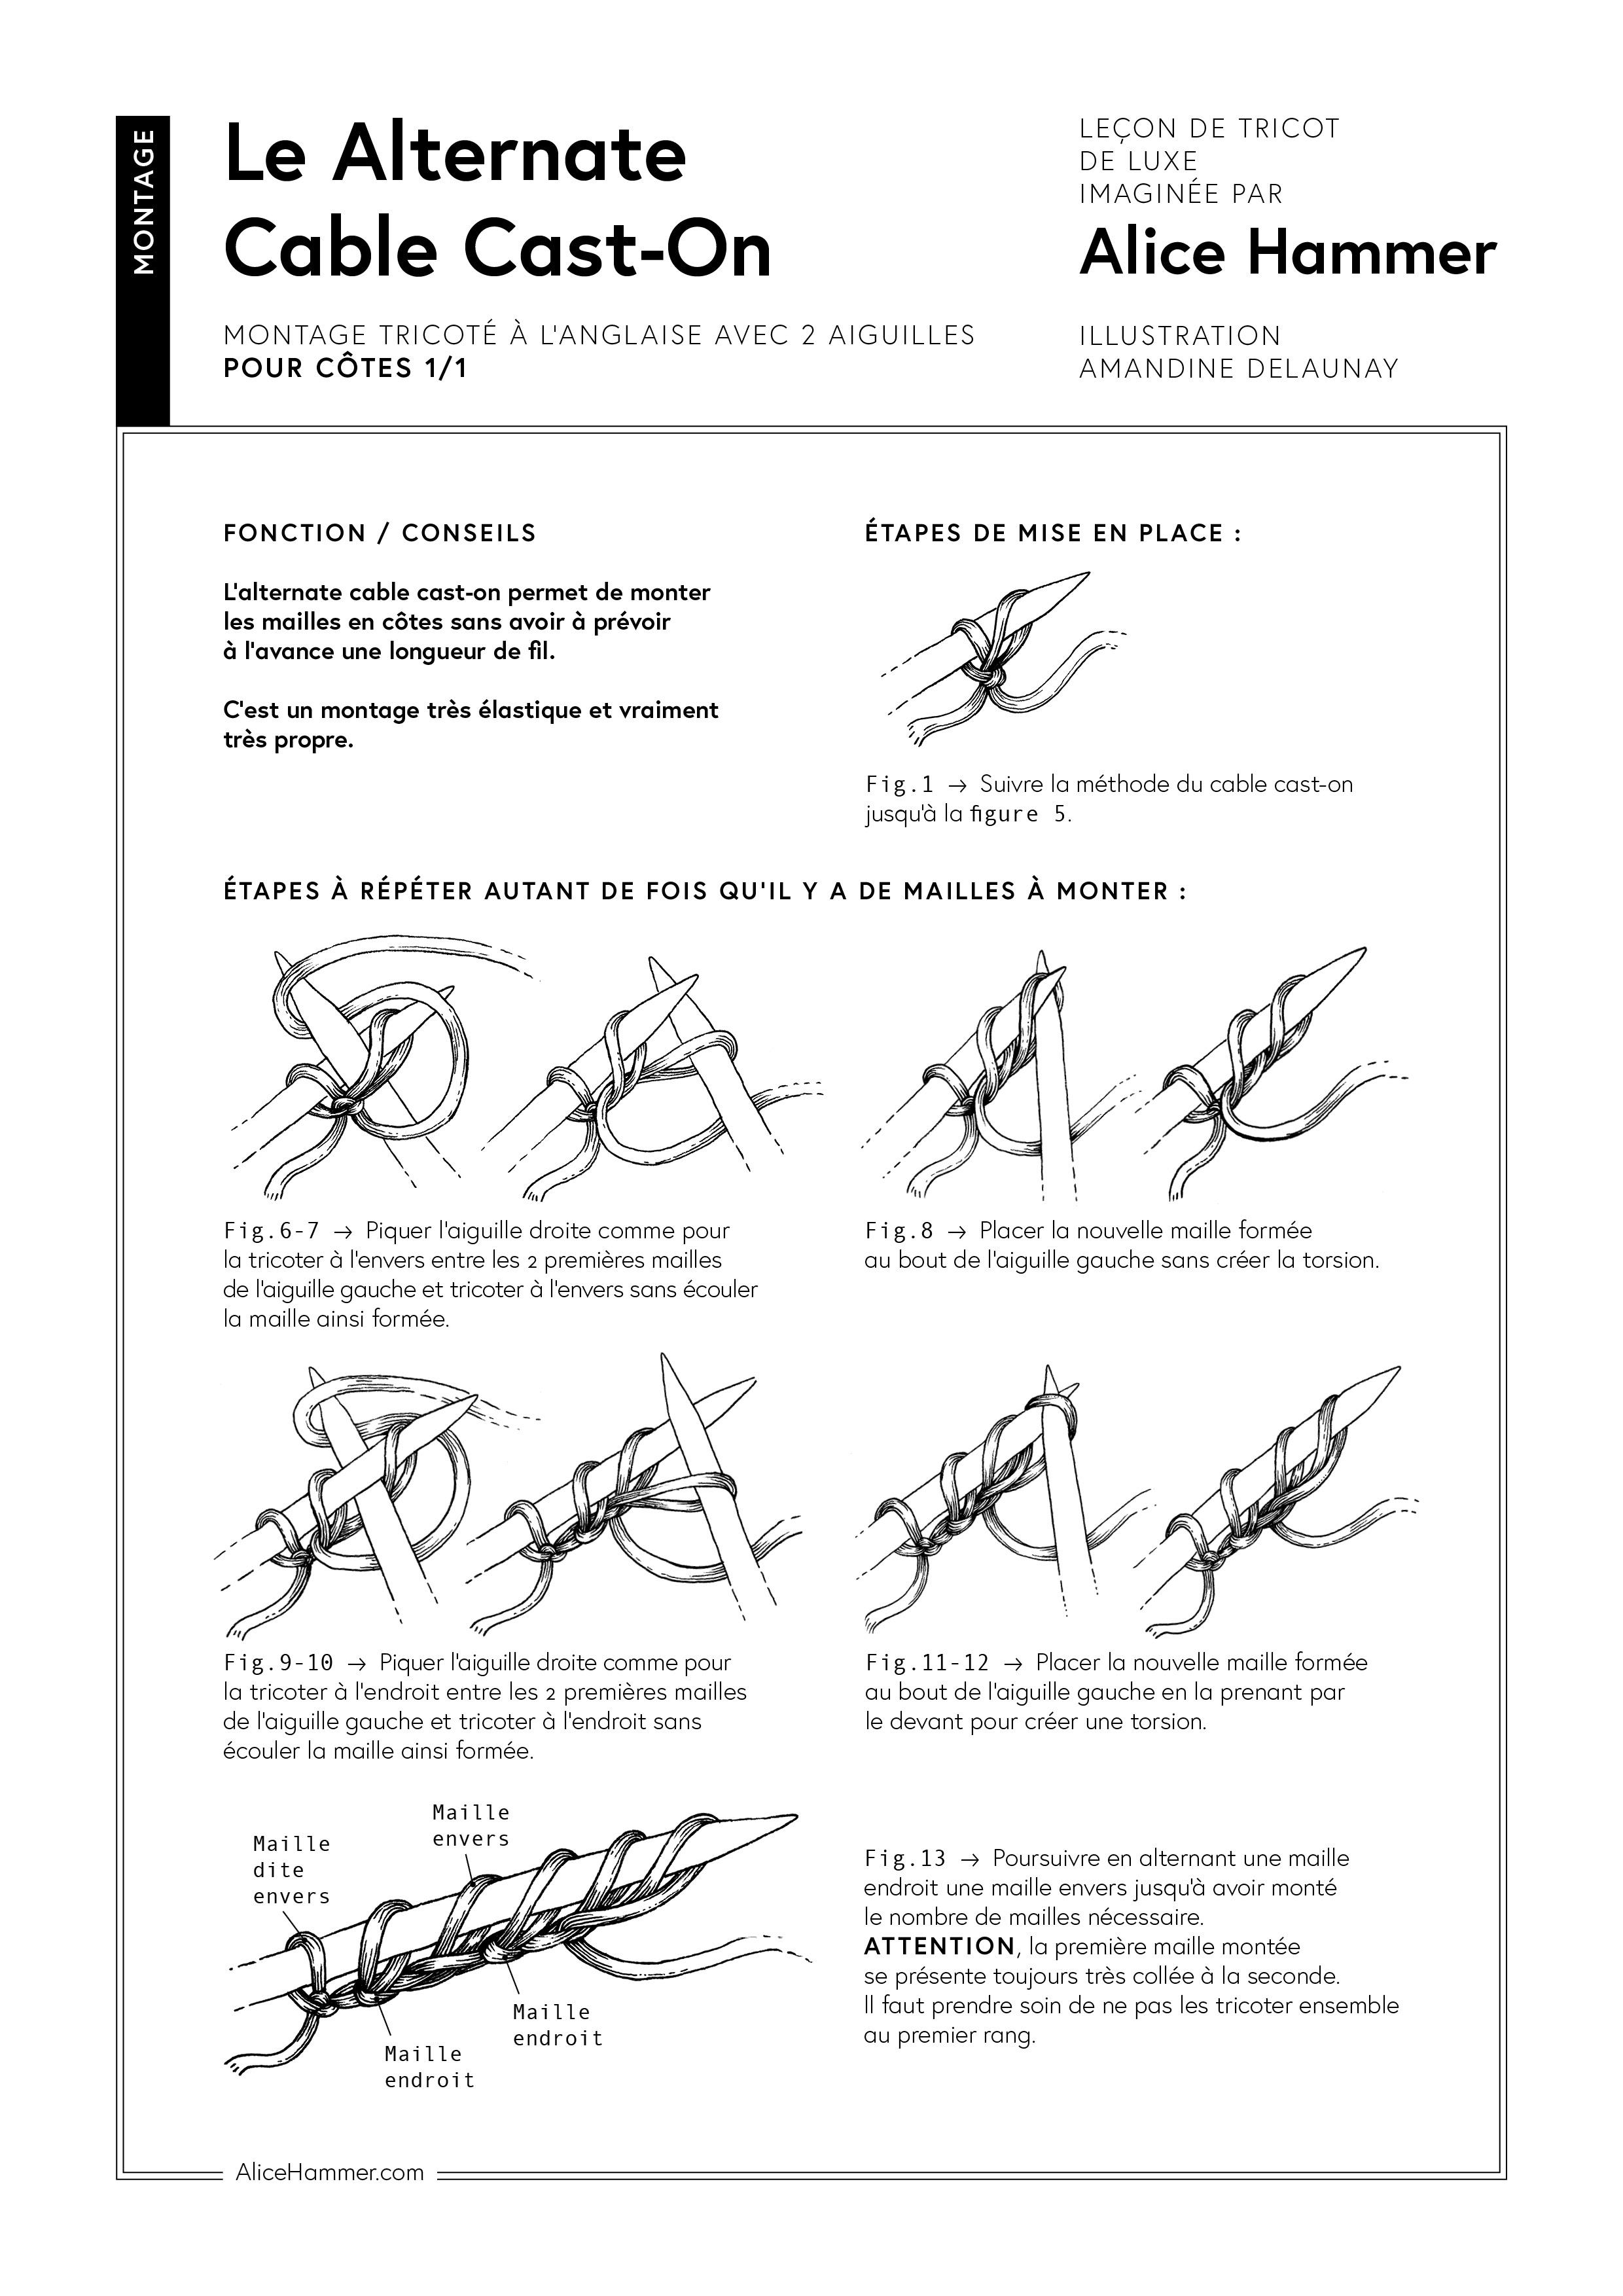 alicehammer-montage-alternatecablecaston.jpg